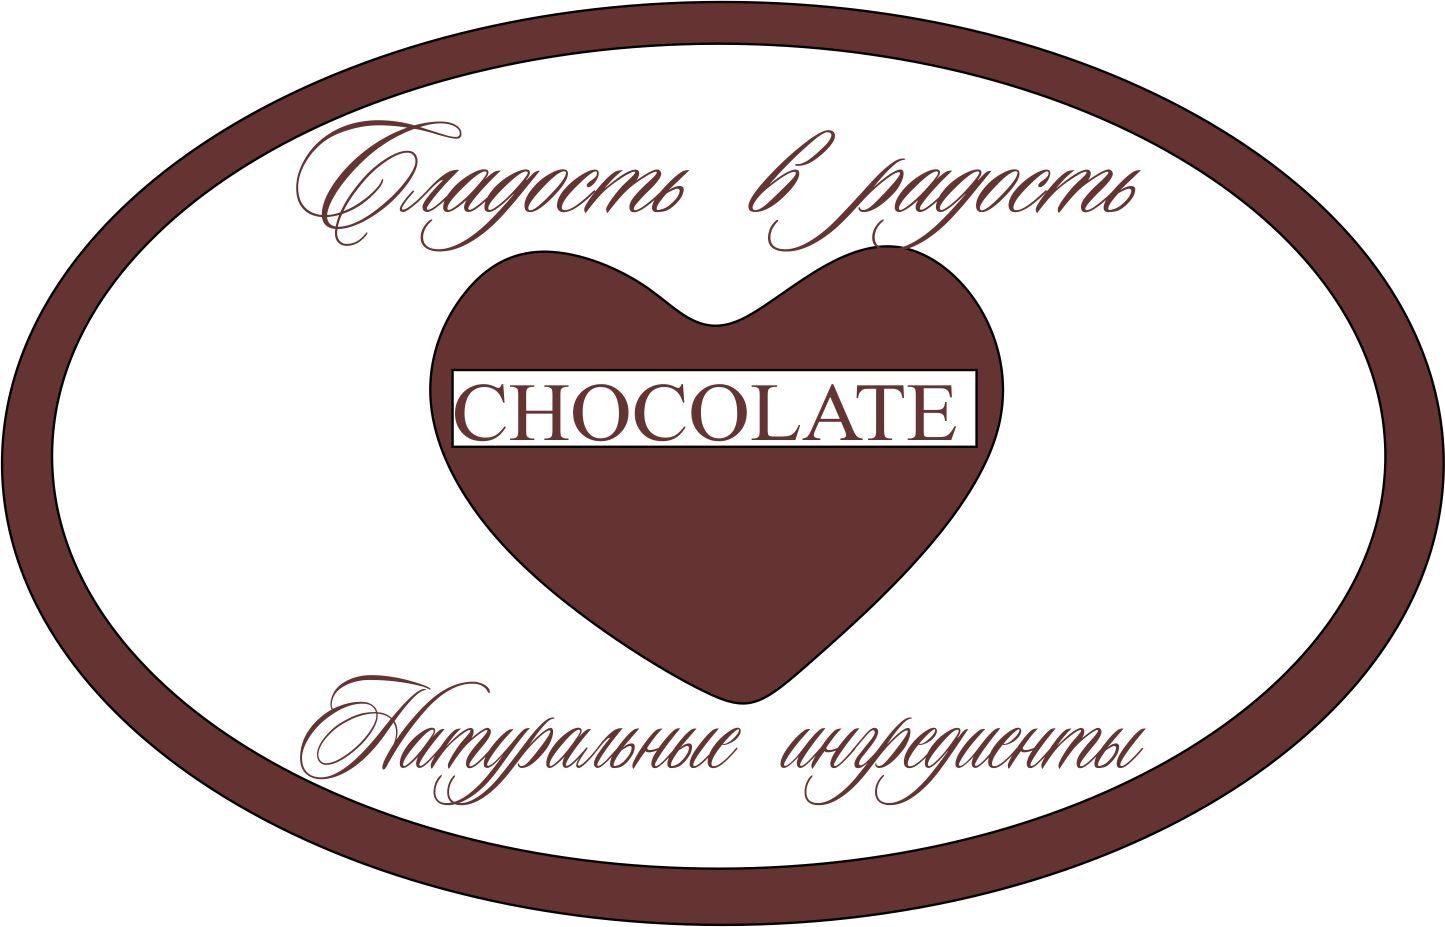 Разработка логотипа магазина сладостей со всего мира. фото f_3495a27116c760e7.jpg